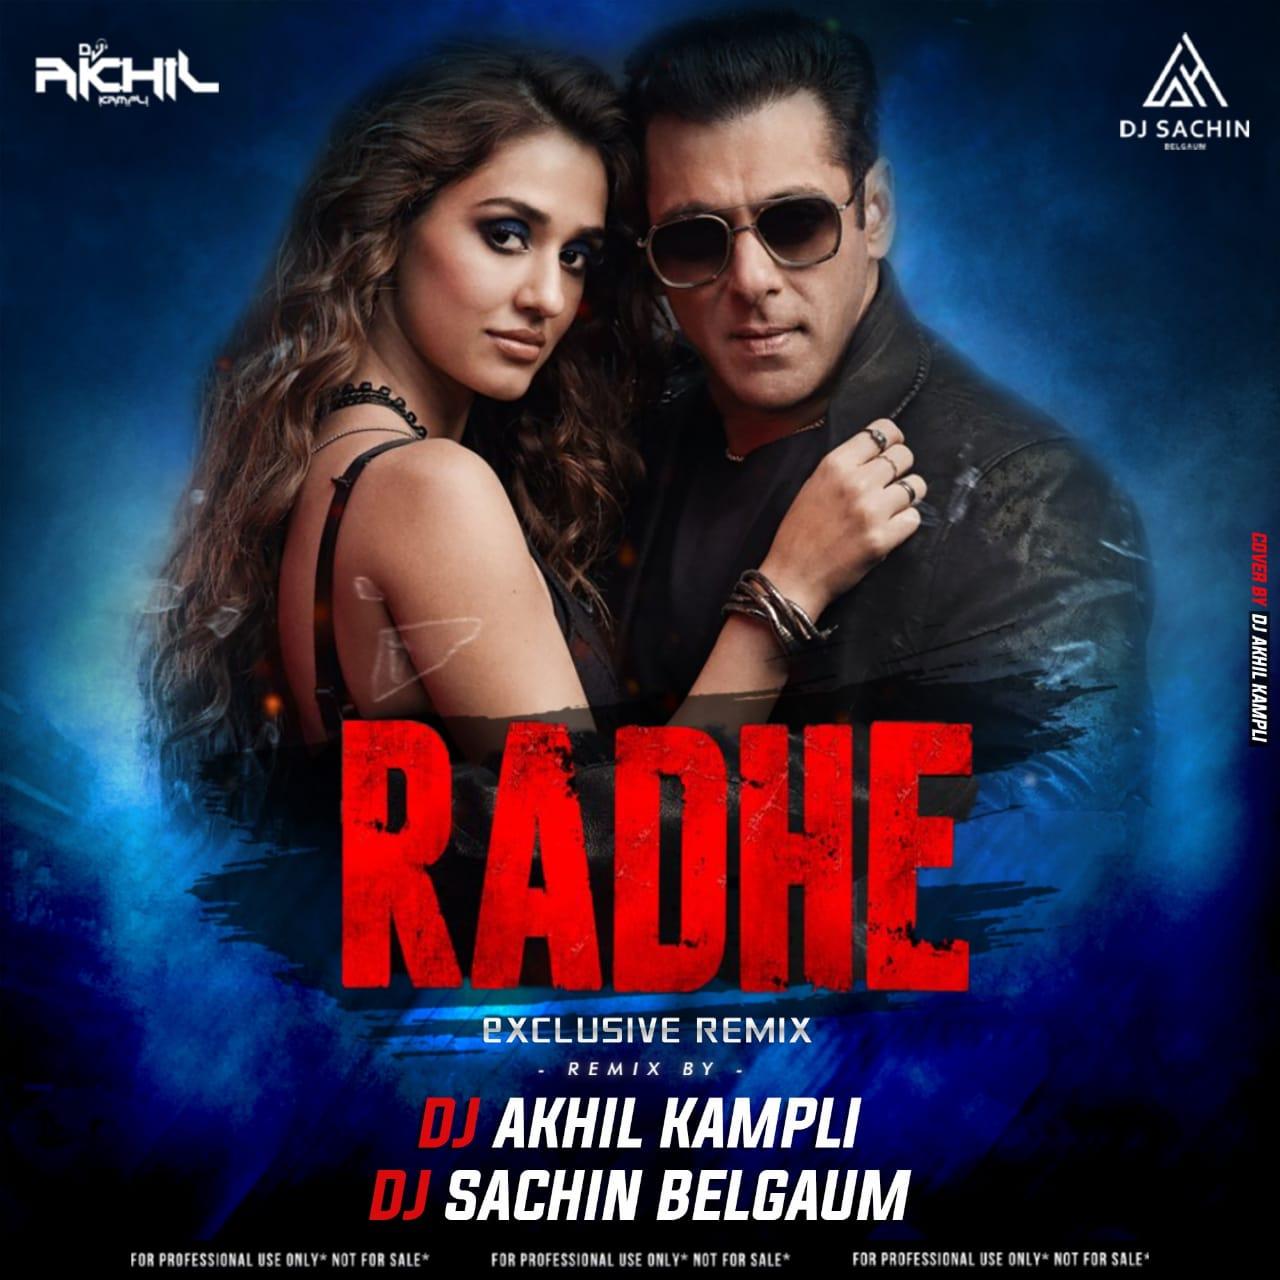 Radhe Title Track Remix x Dj Akhil Kampli x Dj Sachin Belgaum